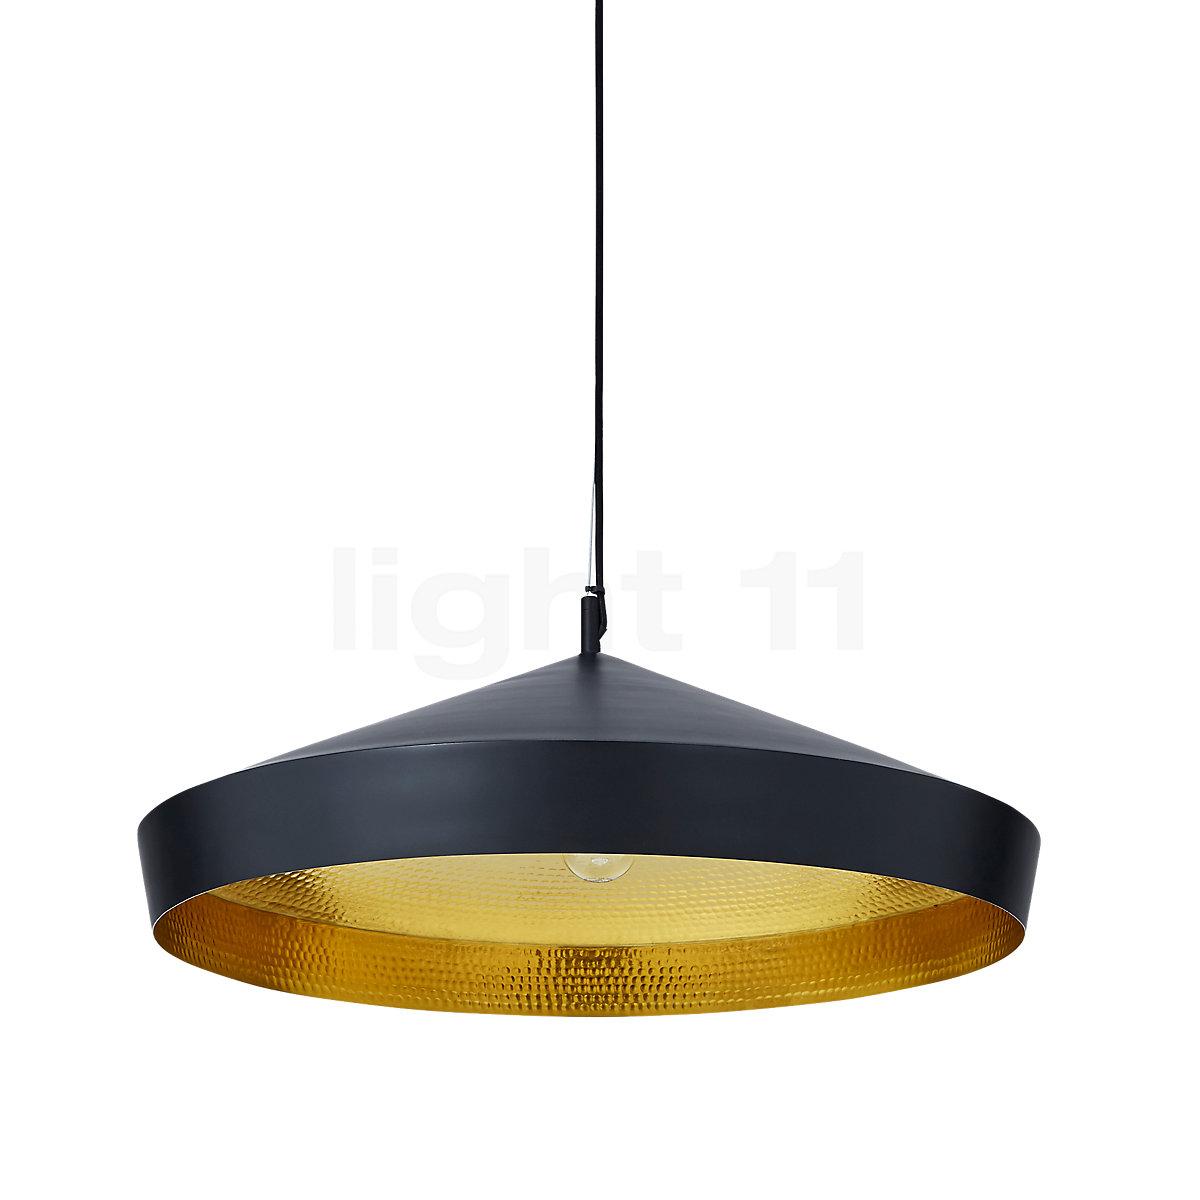 Buy Tom Dixon Beat Flat Pendant Light At Light11 Eu